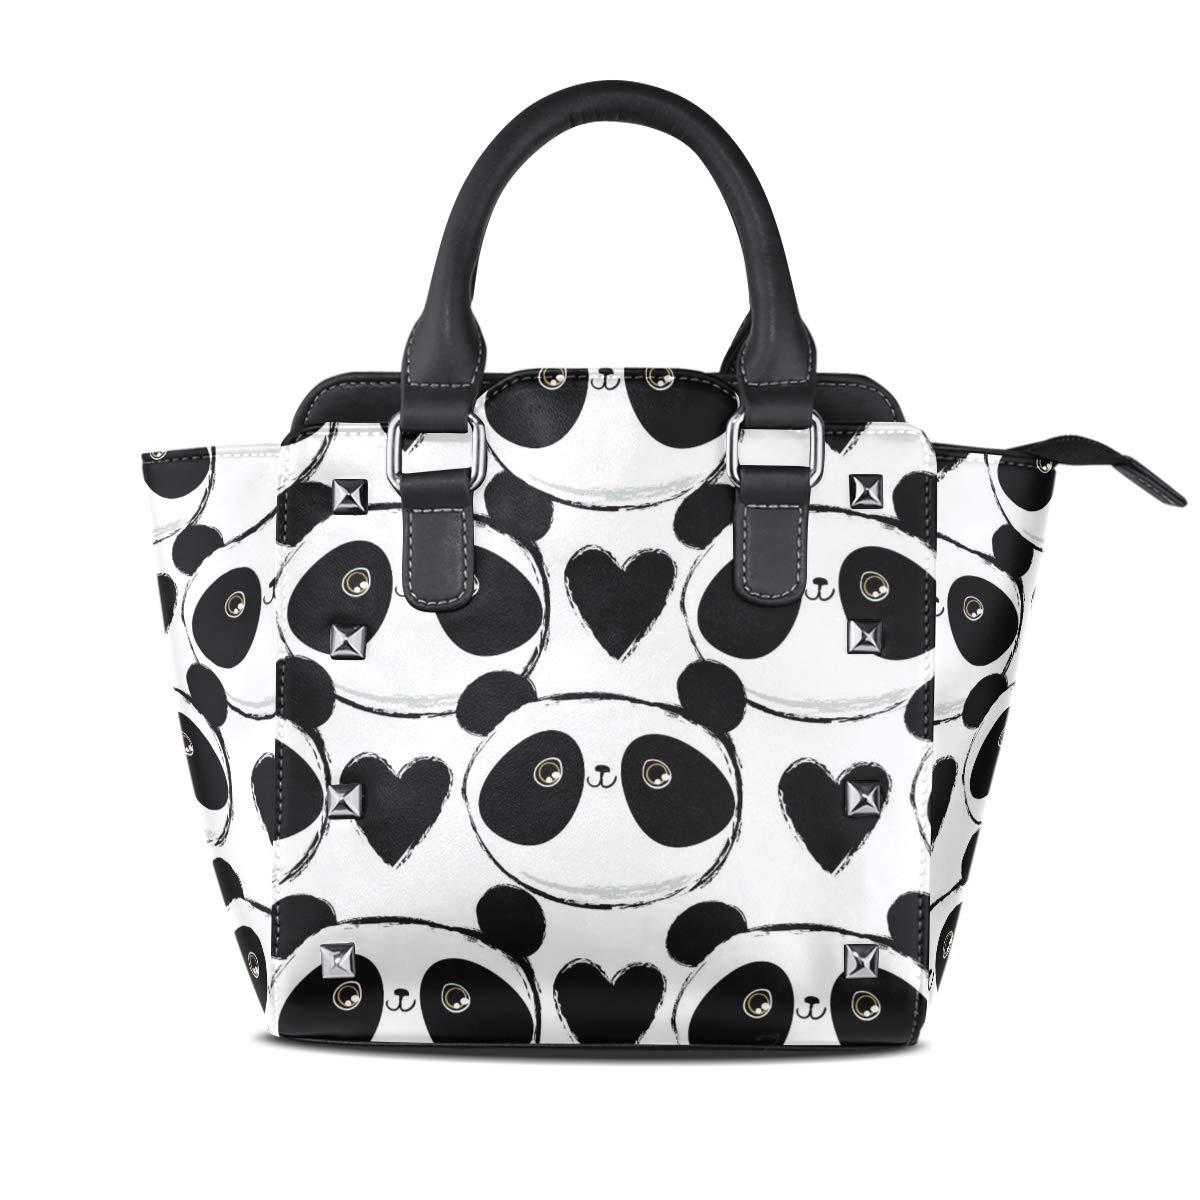 Design5 Handbag Sexy Leopard Print Genuine Leather Tote Rivet Bag Shoulder Strap Top Handle Women